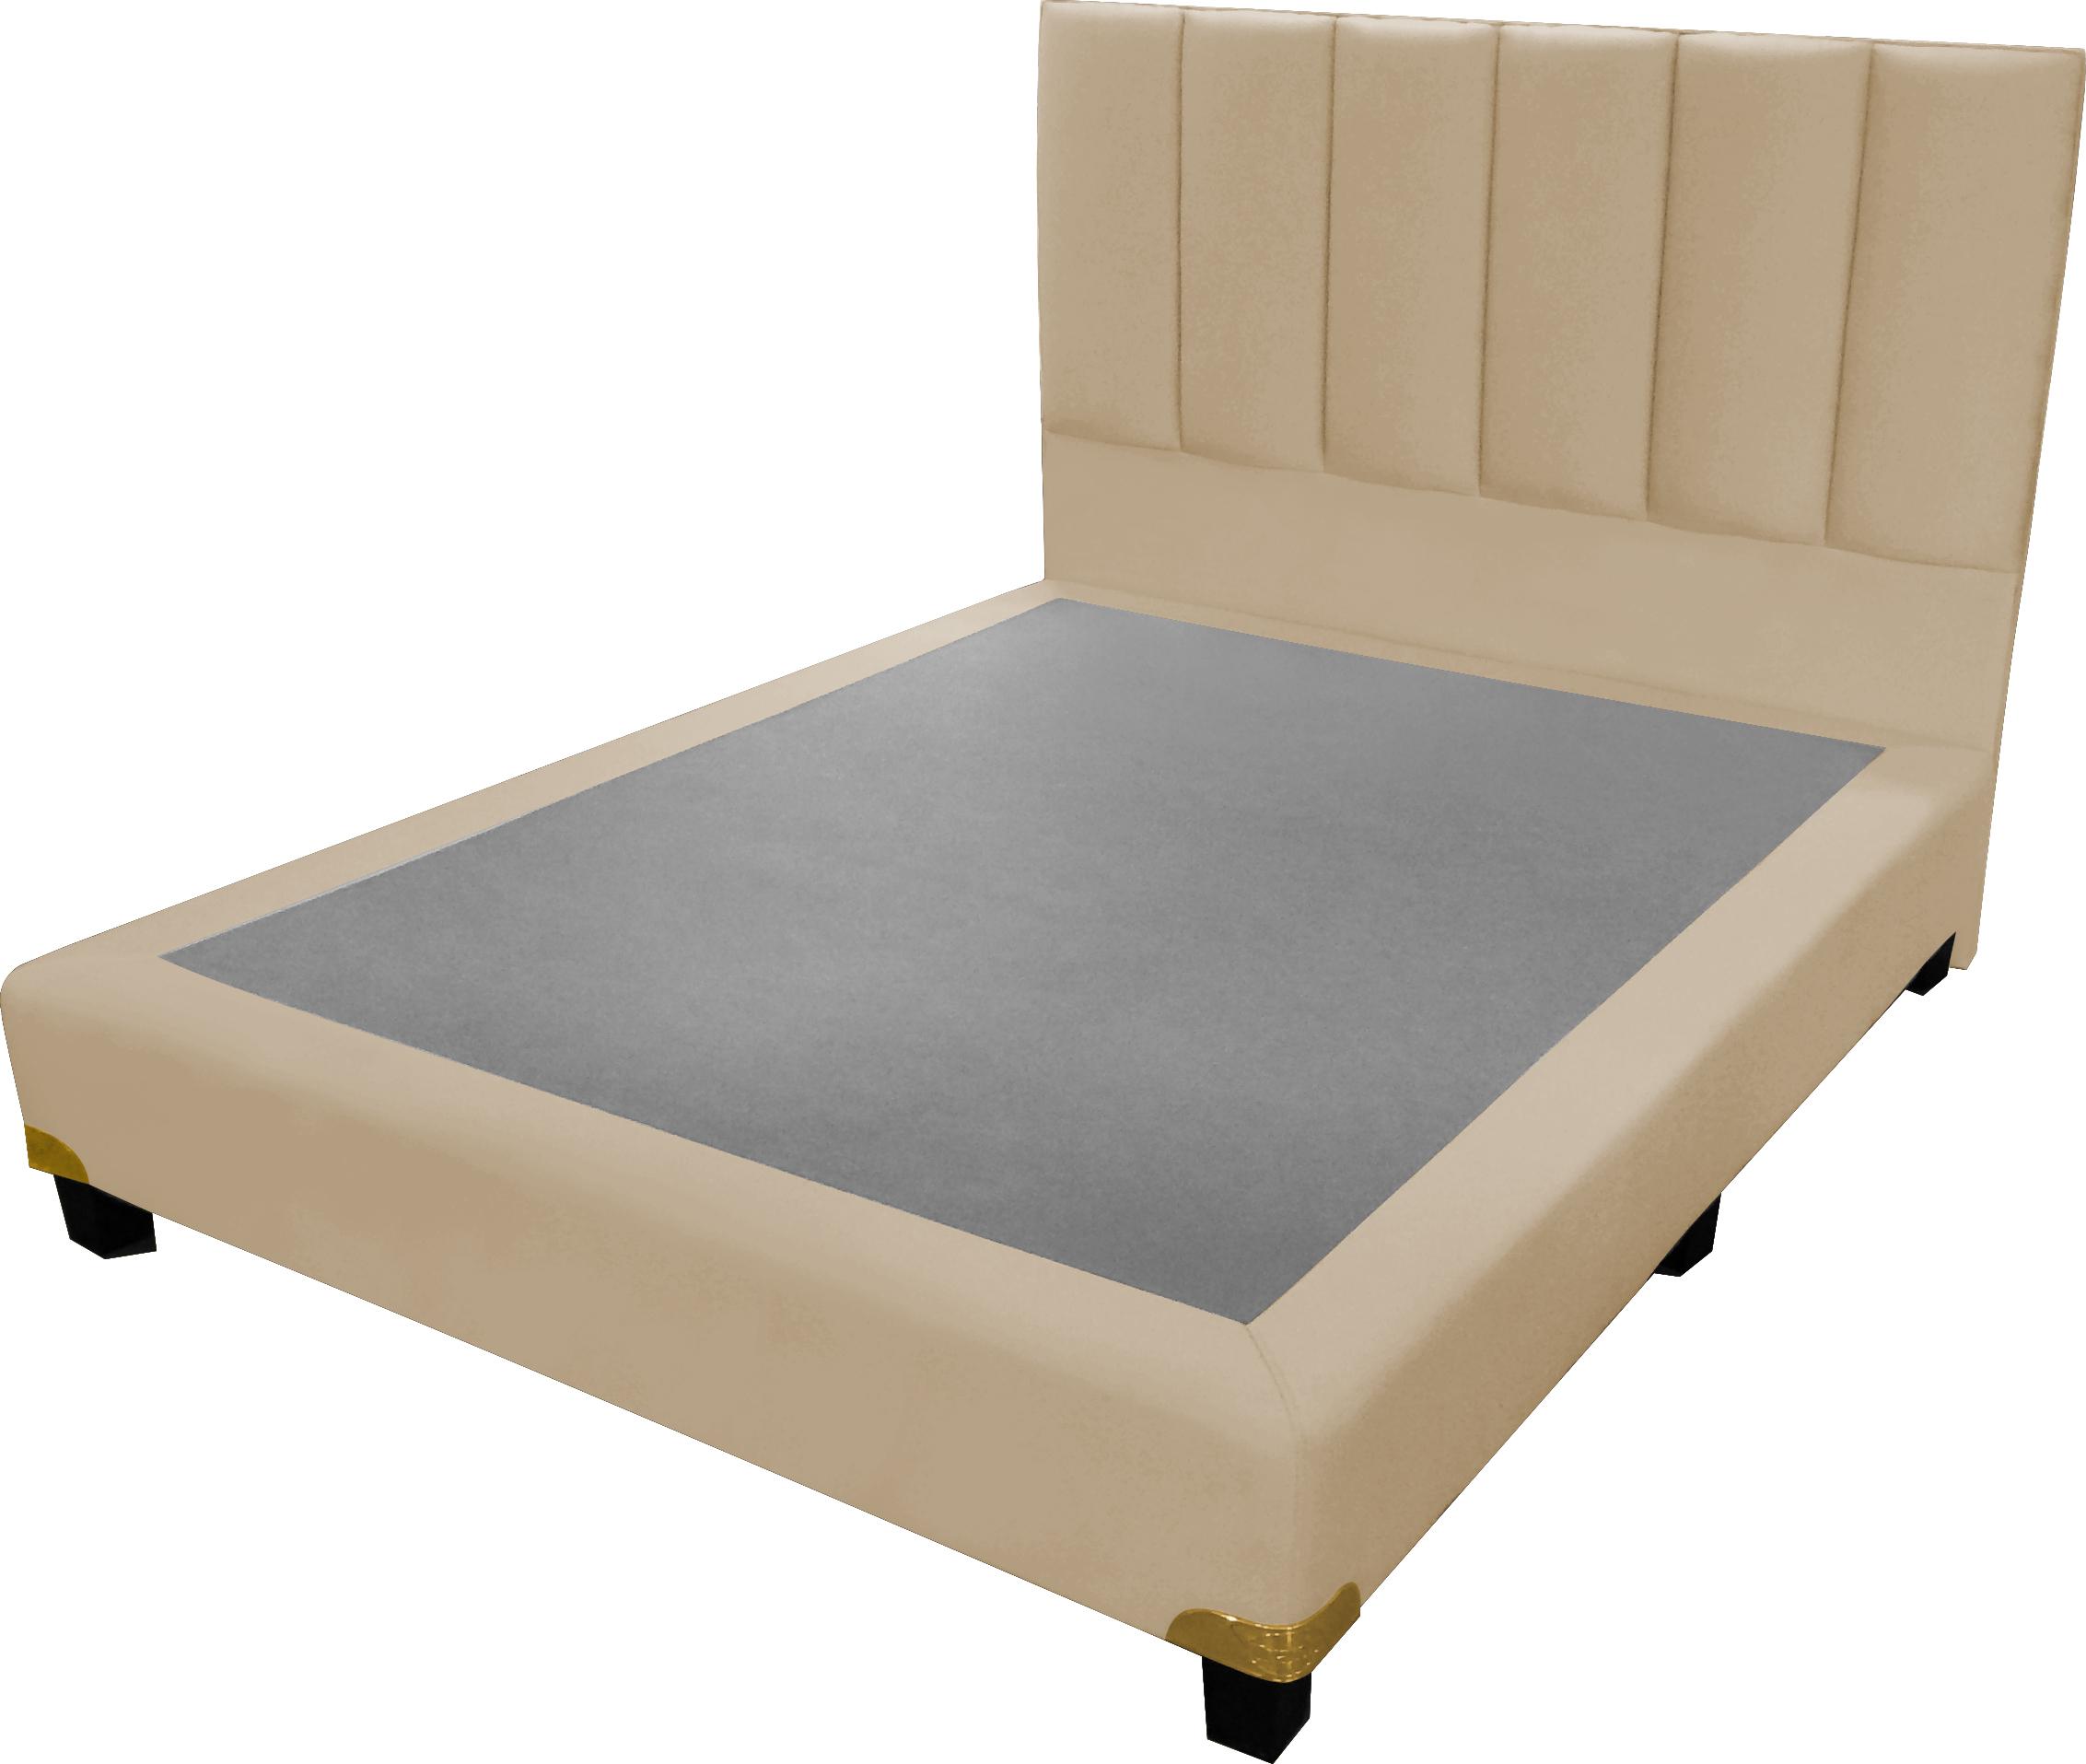 Bed frame Senso Memory wooden bed frame OHRZEXZ